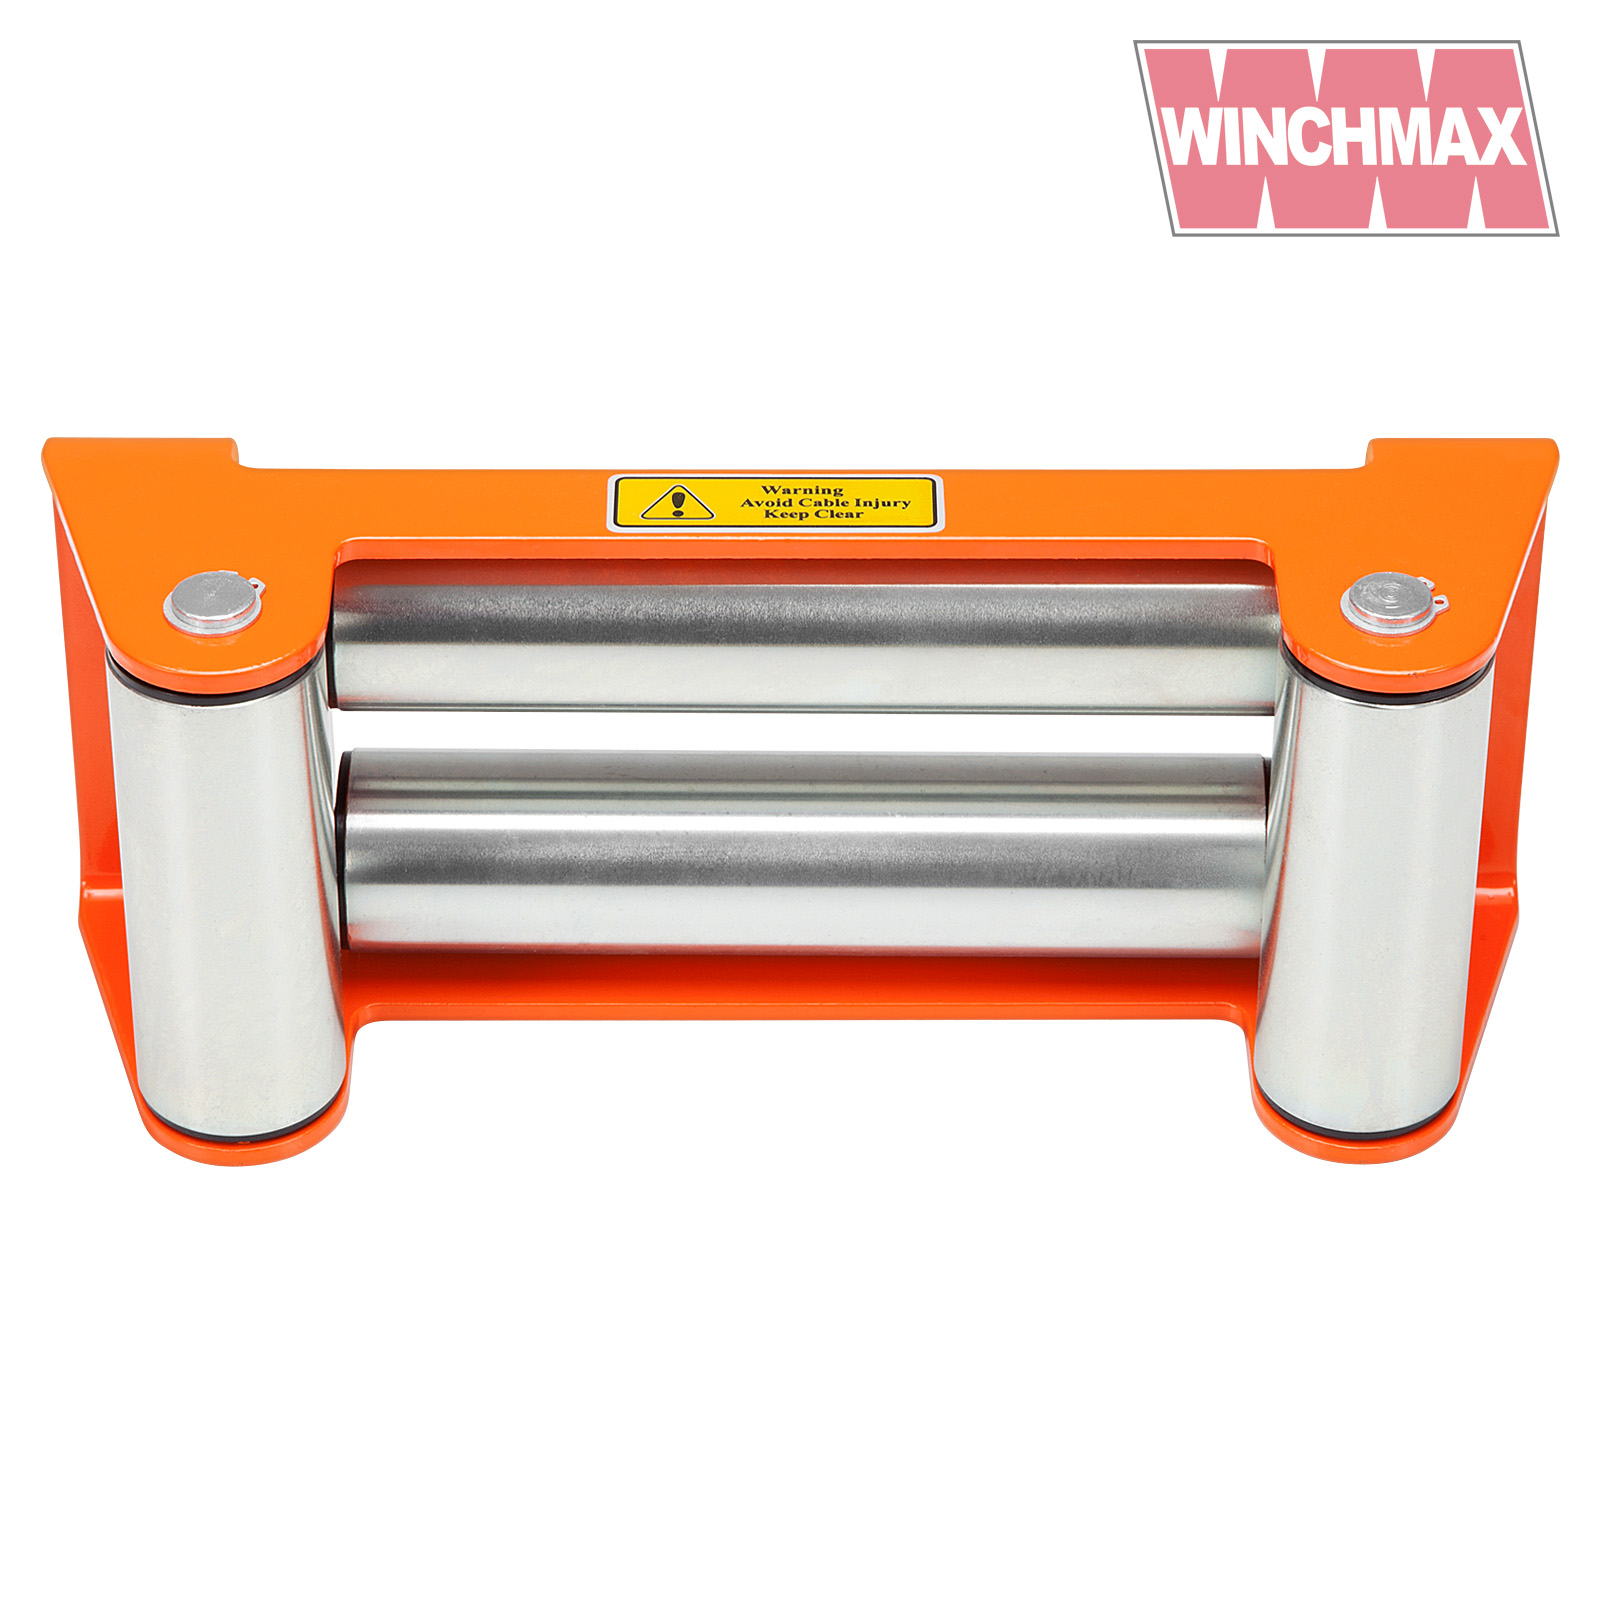 Wmrfo winchmax 310